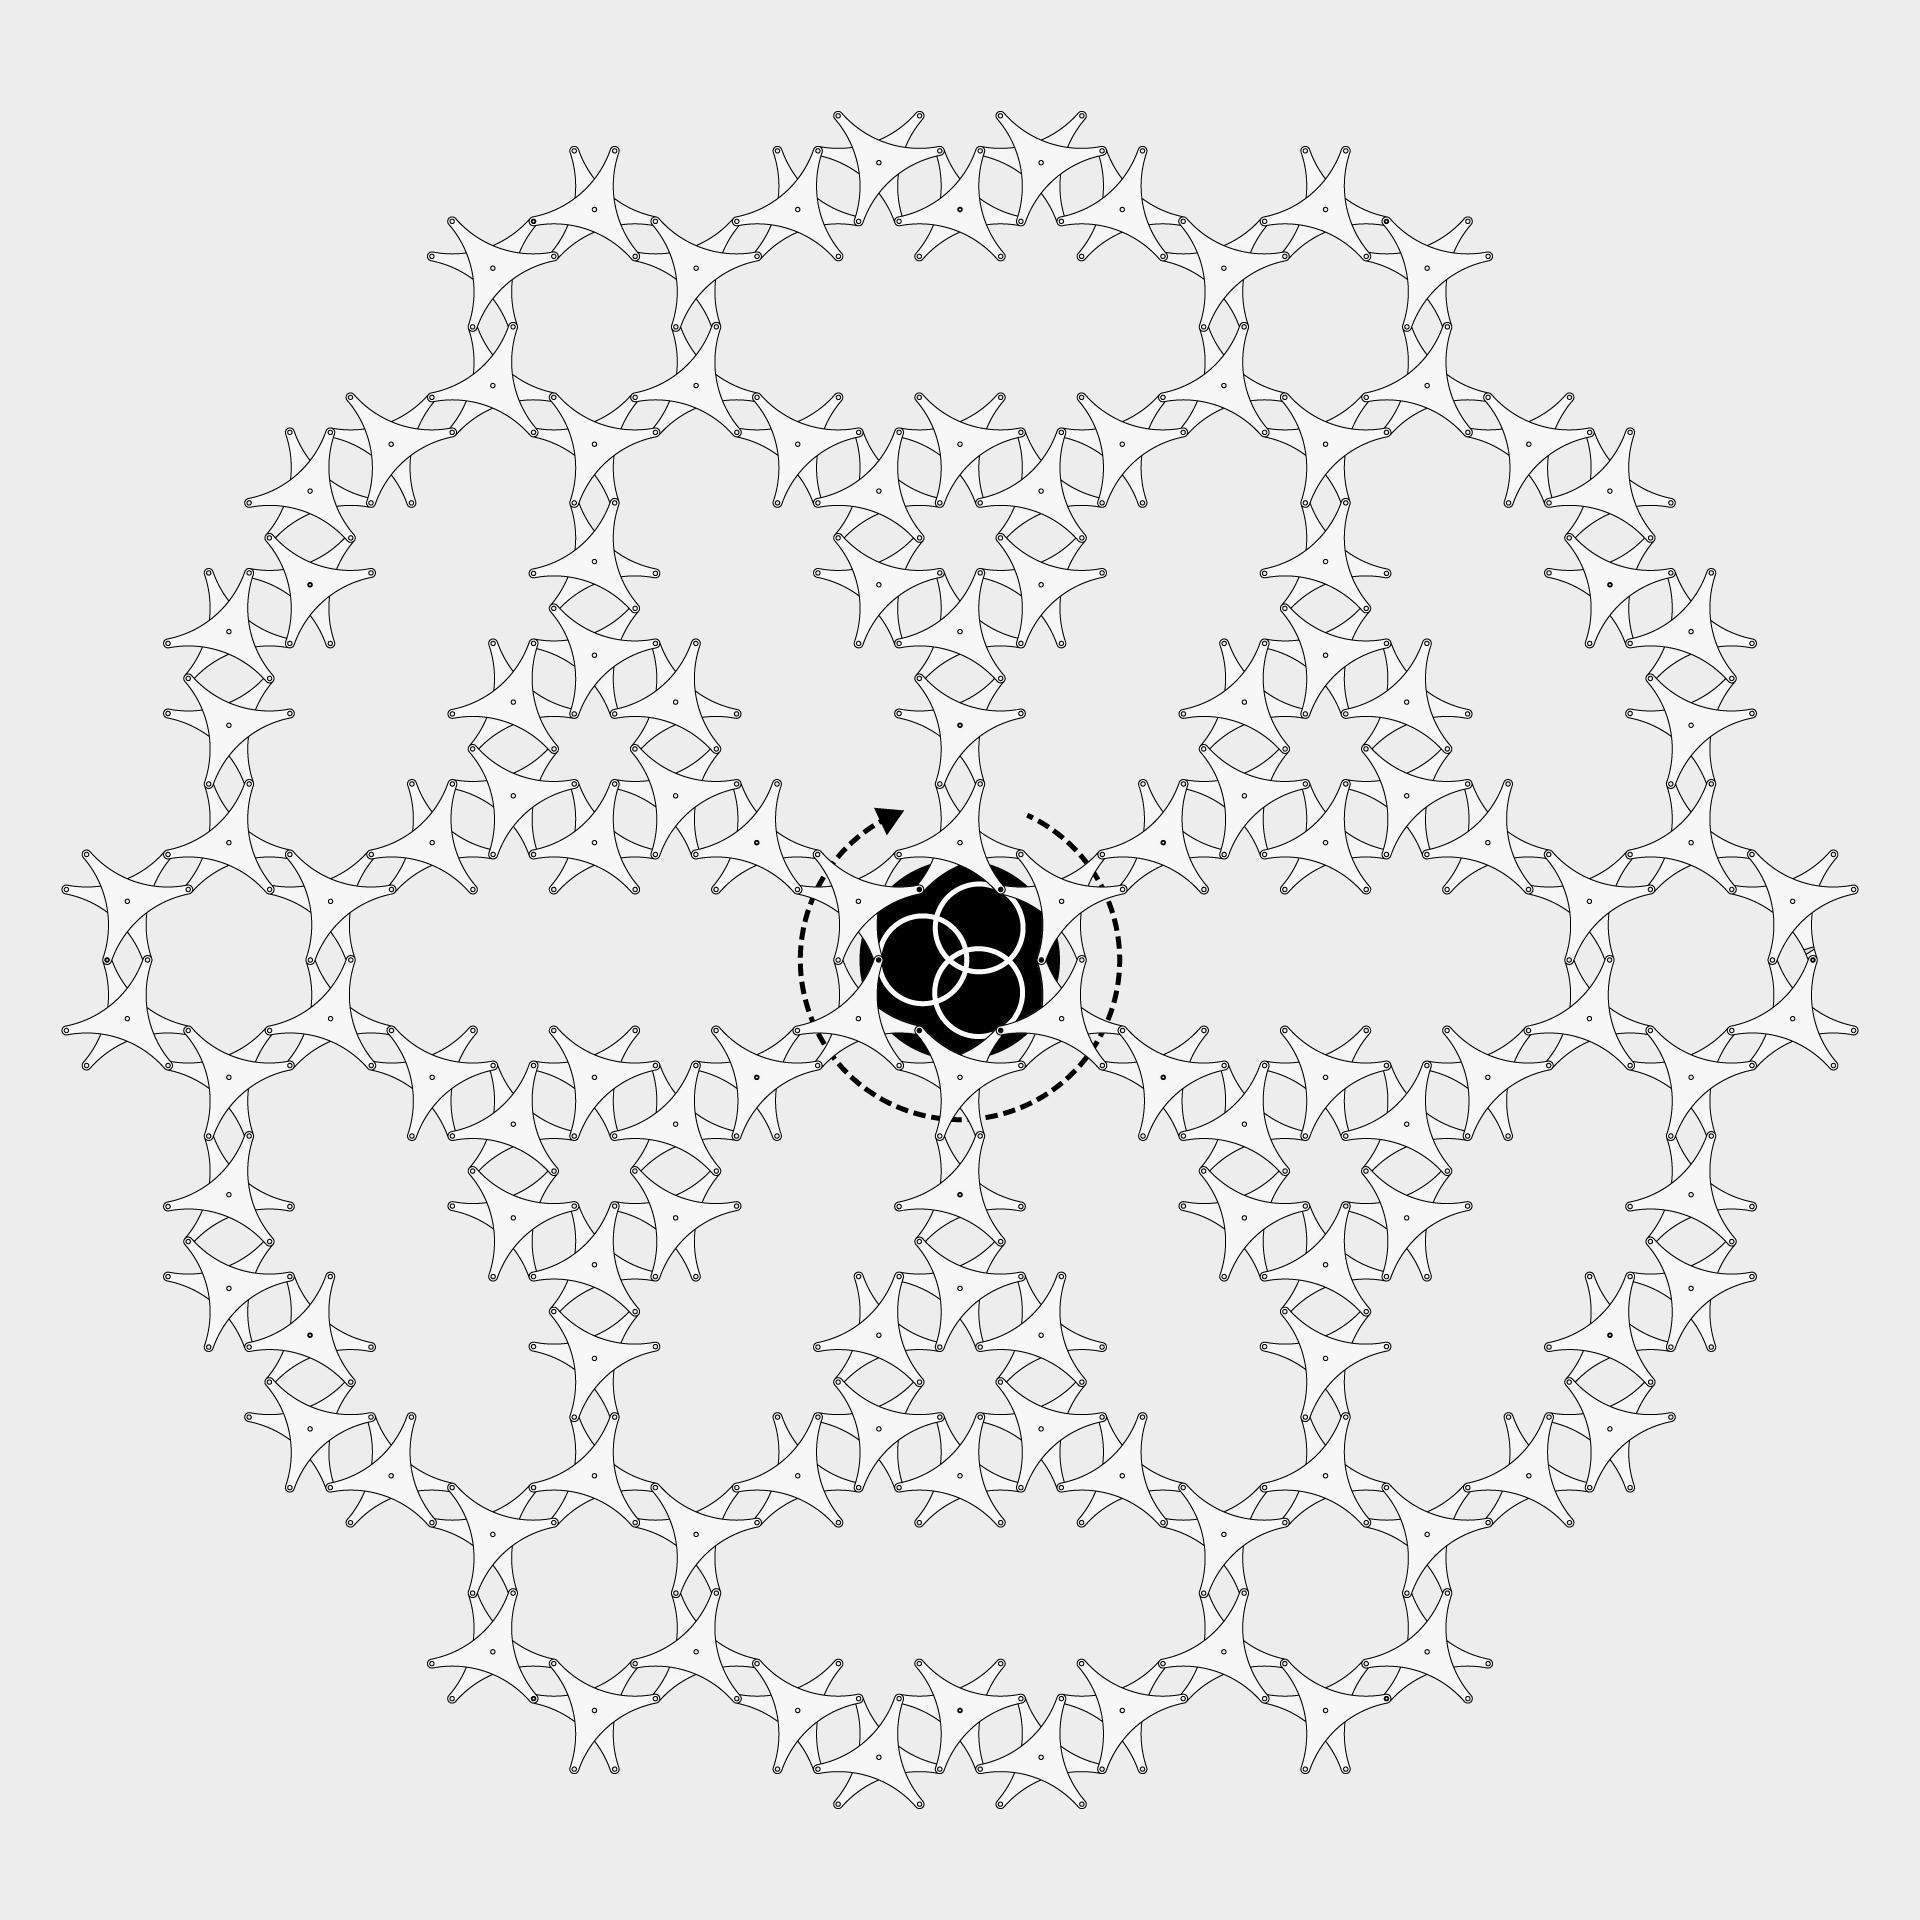 rlon-kinetic-art-installation-samsara_mechanics.jpg